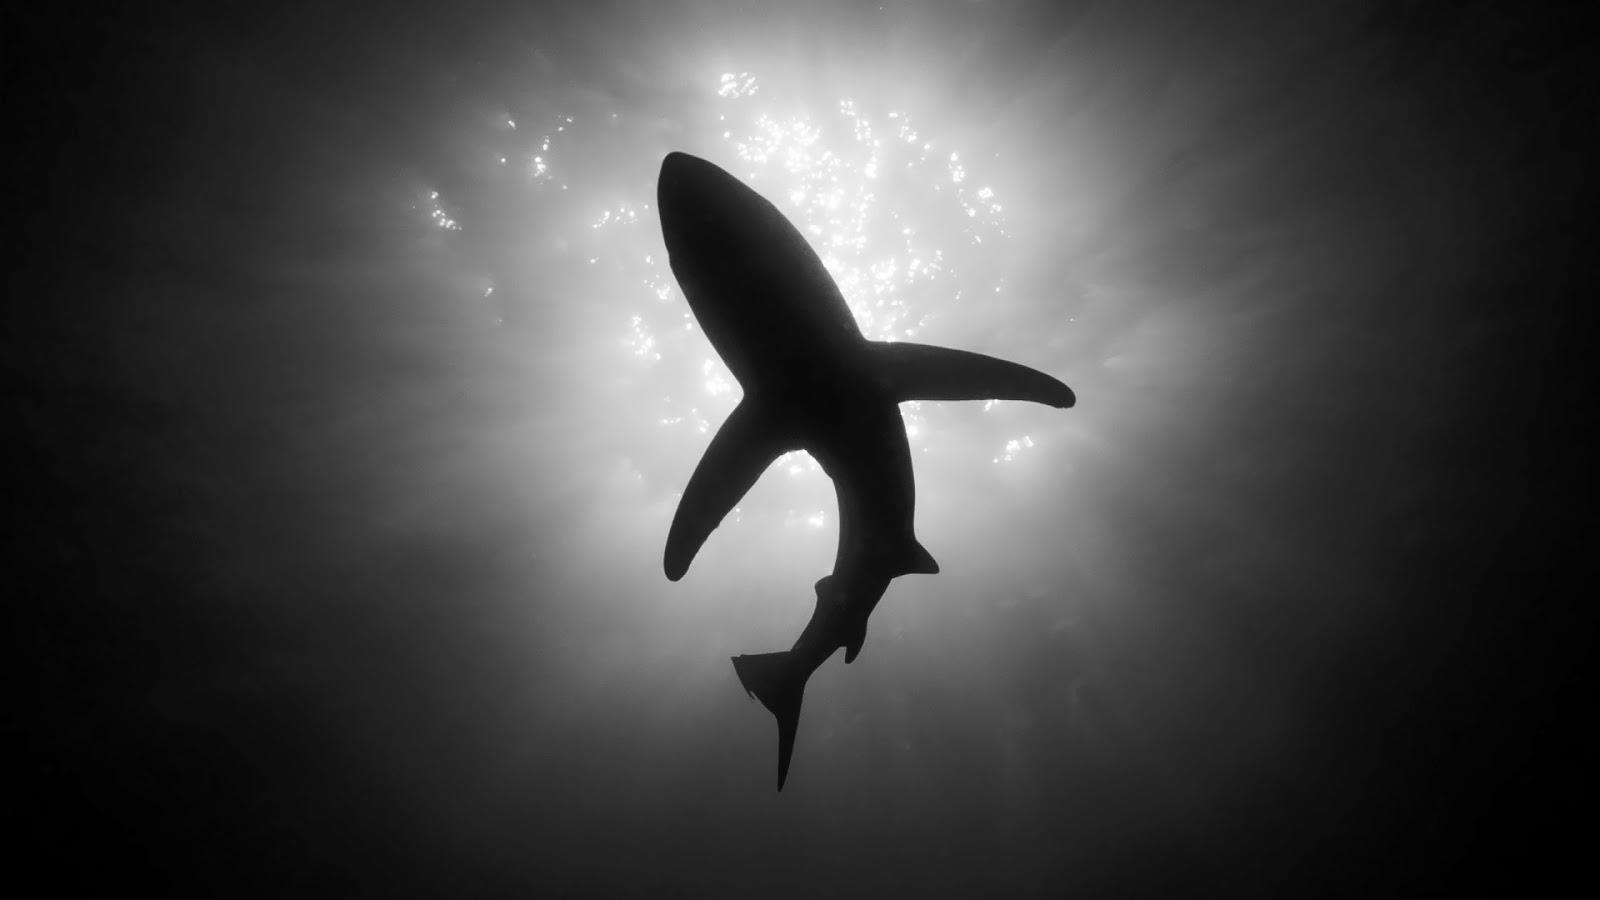 8000 Wallpaper Hd Black Shark 2 HD